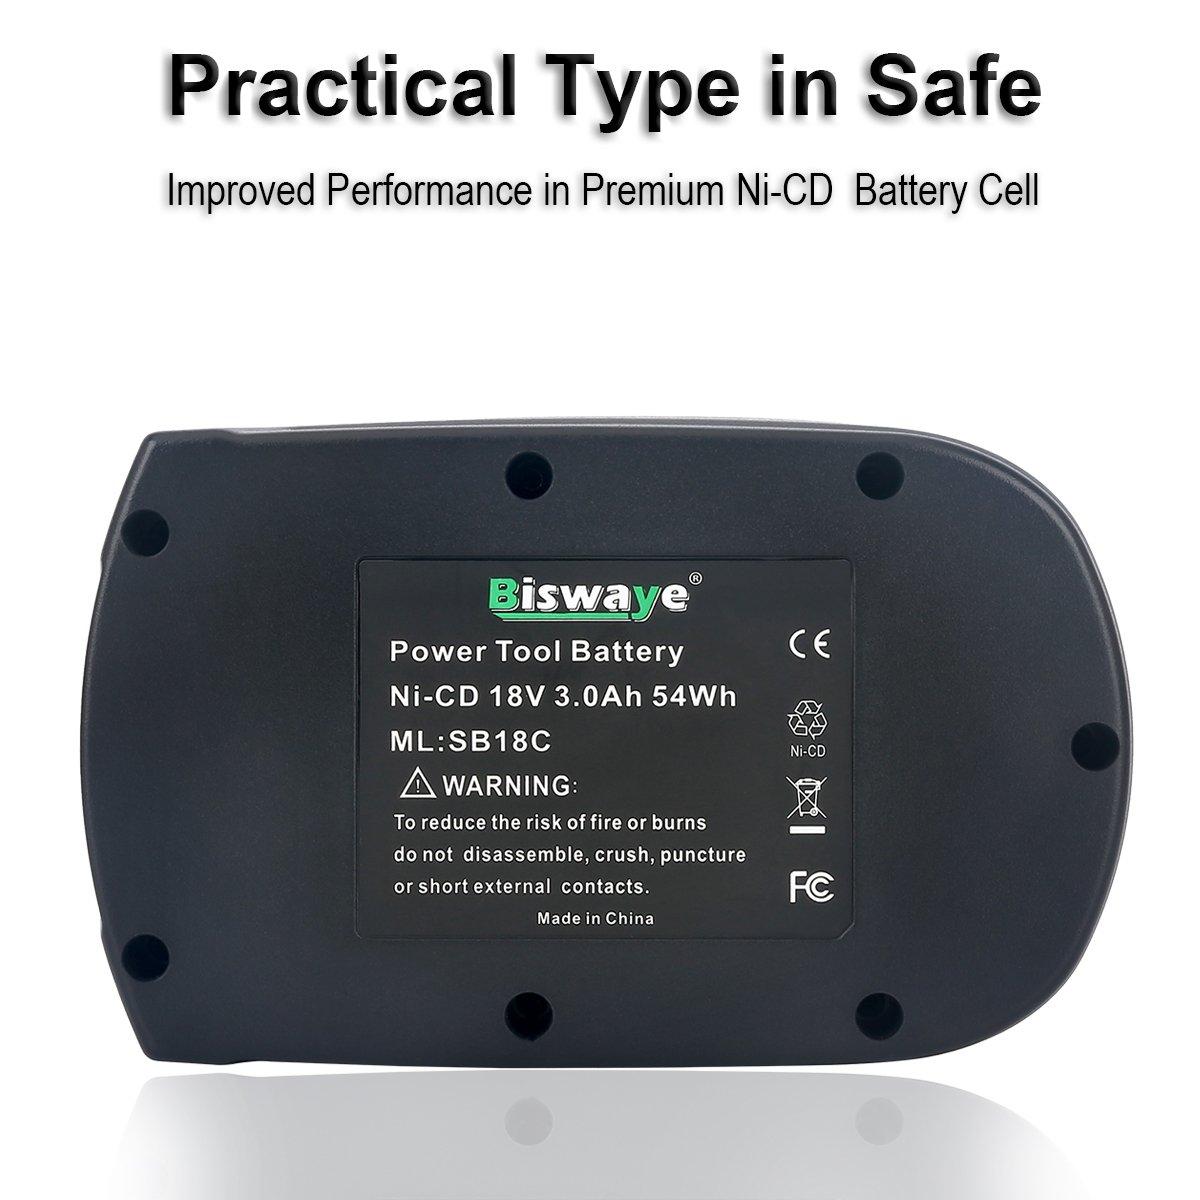 Biswaye 2Pack 18V Battery SB18C SB18A SB18B for Skil 18V Select System Cordless Tools 2810 2888 2895 2897 2898 4570 5850 5995 7305 9350, 3000mAh Ni-Cd by Biswaye (Image #4)